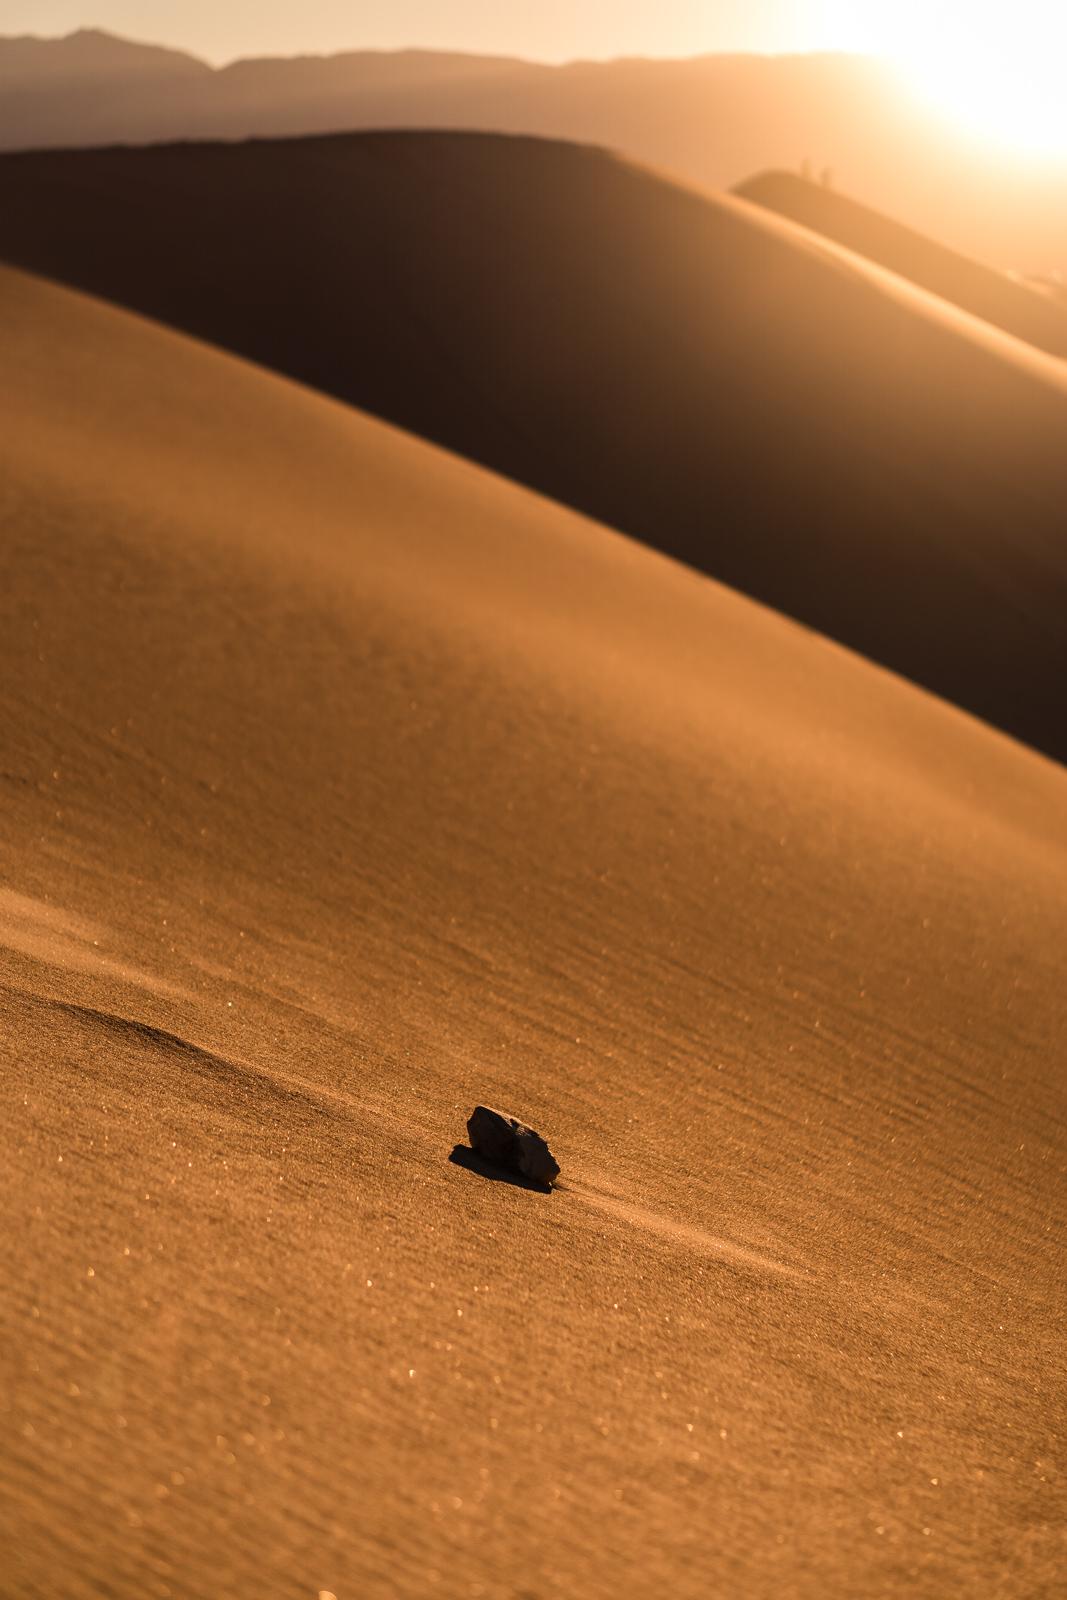 12_Death-Valley-dunes-landscape_Joseph-Barber-Studios.jpg